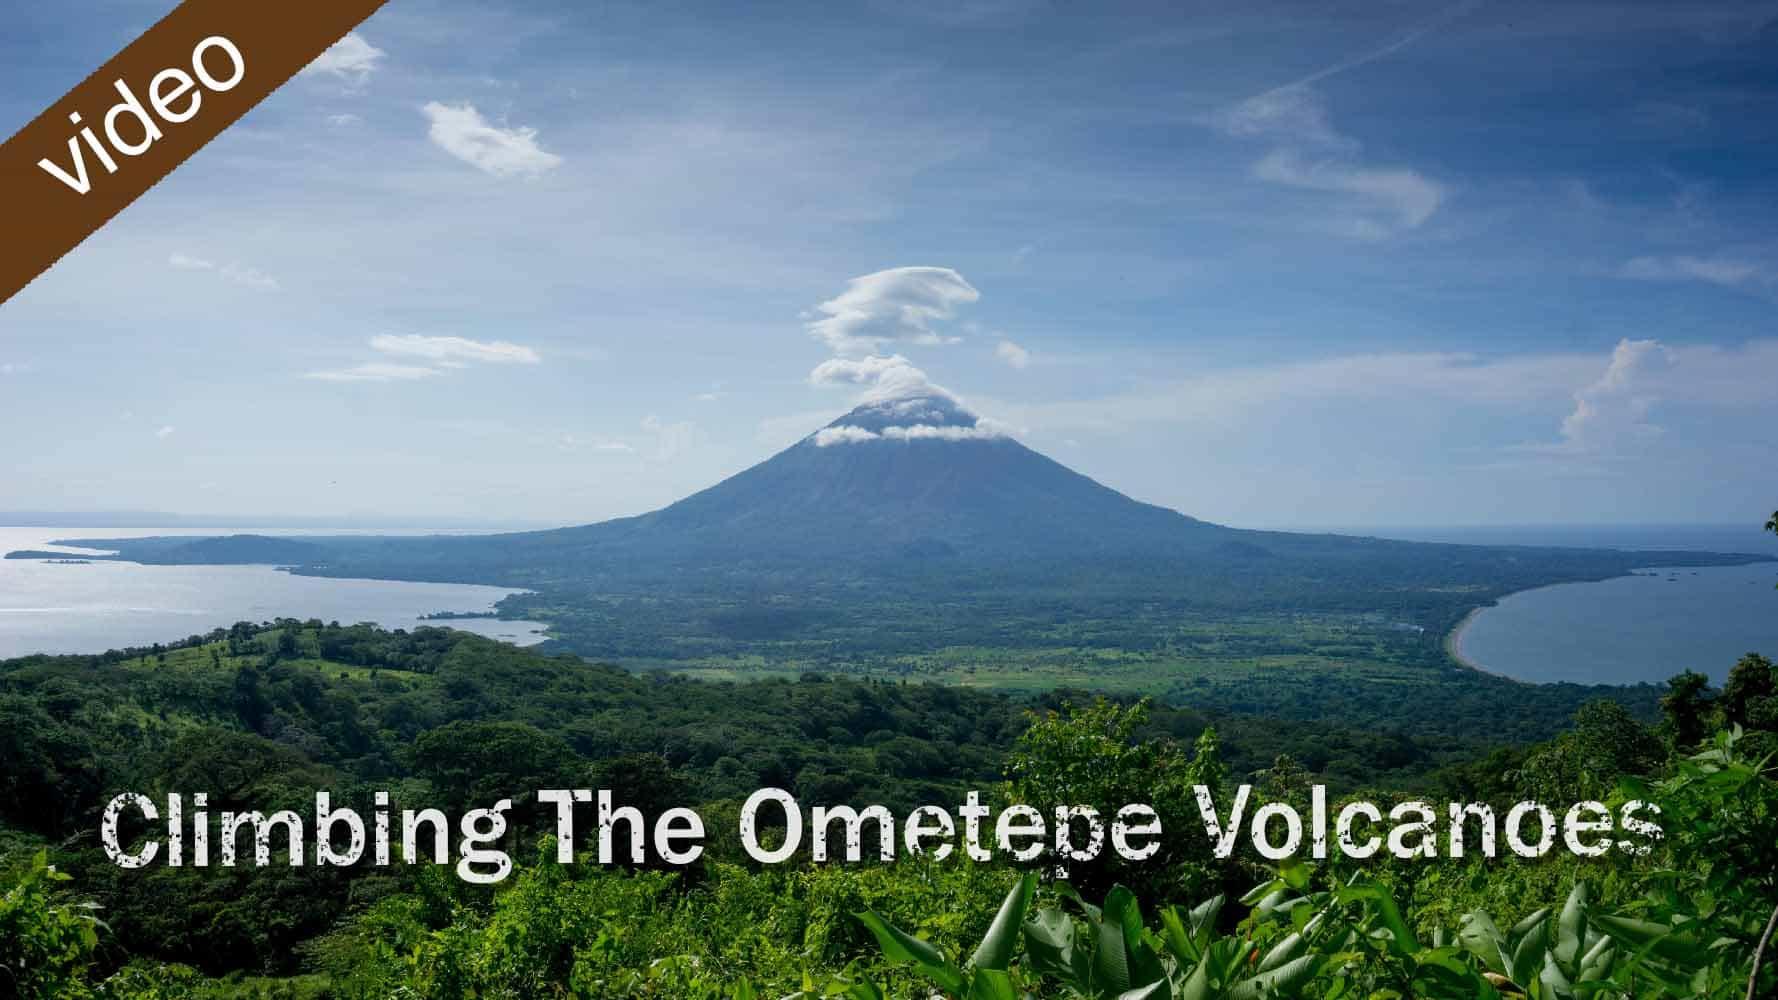 Climbing The Ometepe Volcanos Video